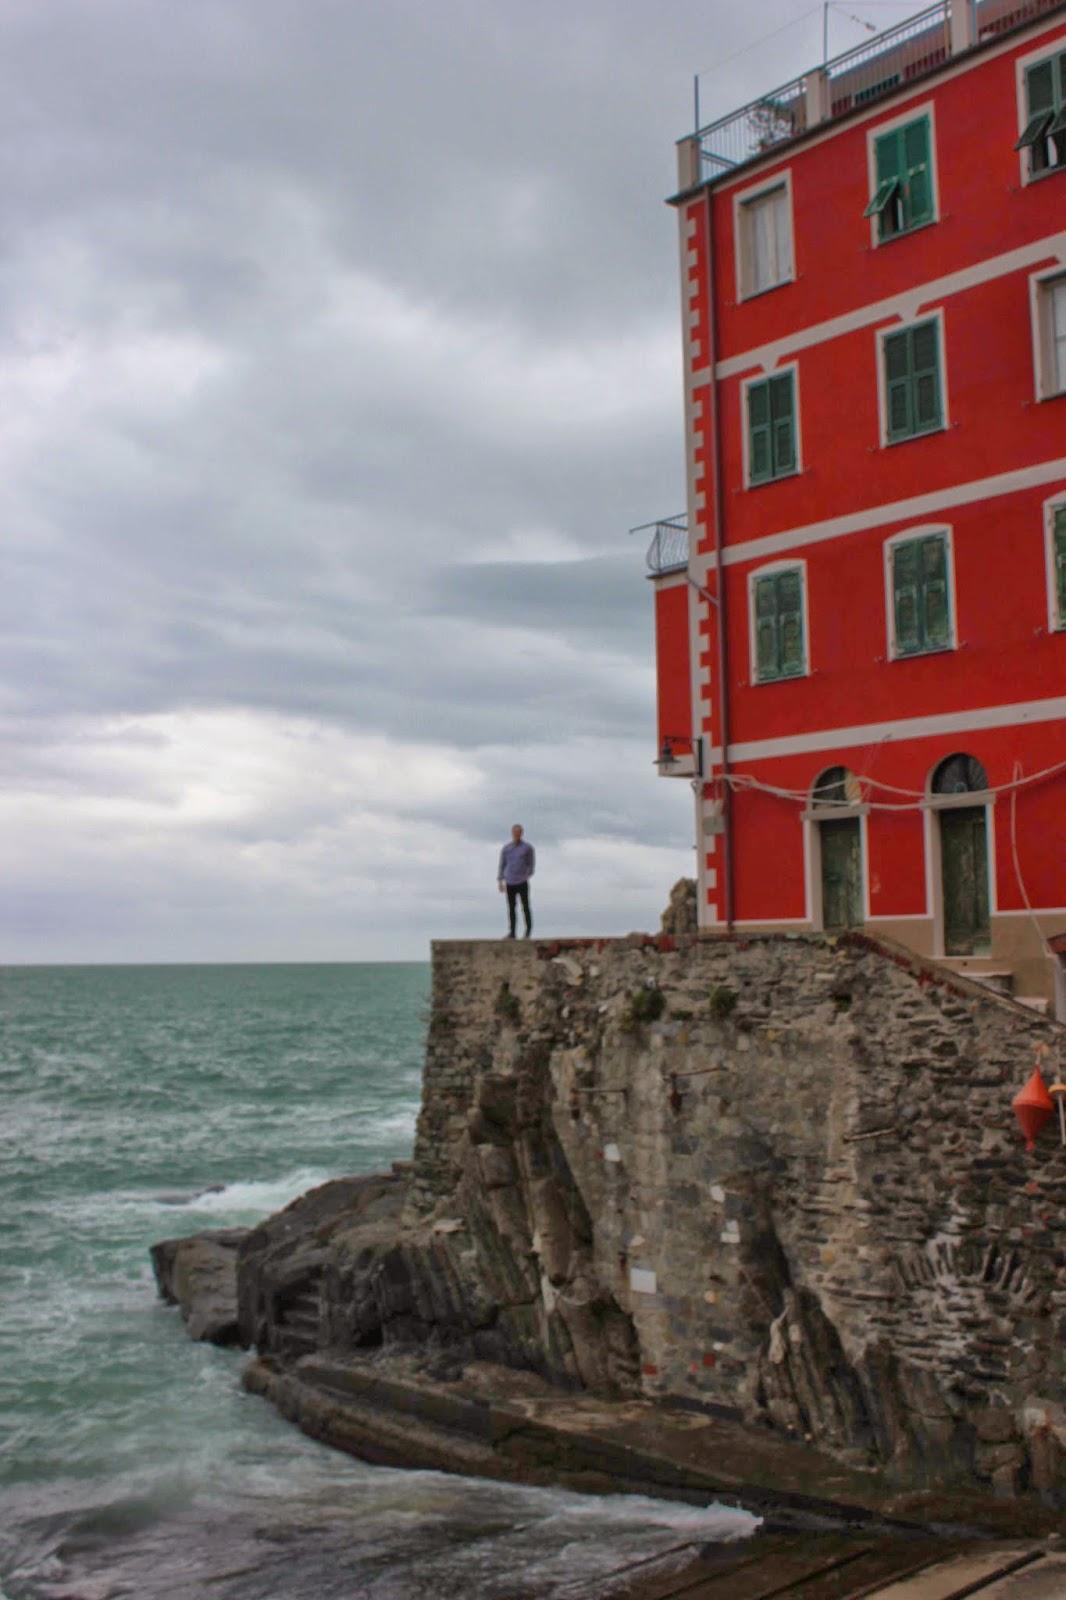 cinque terre travel guide italy